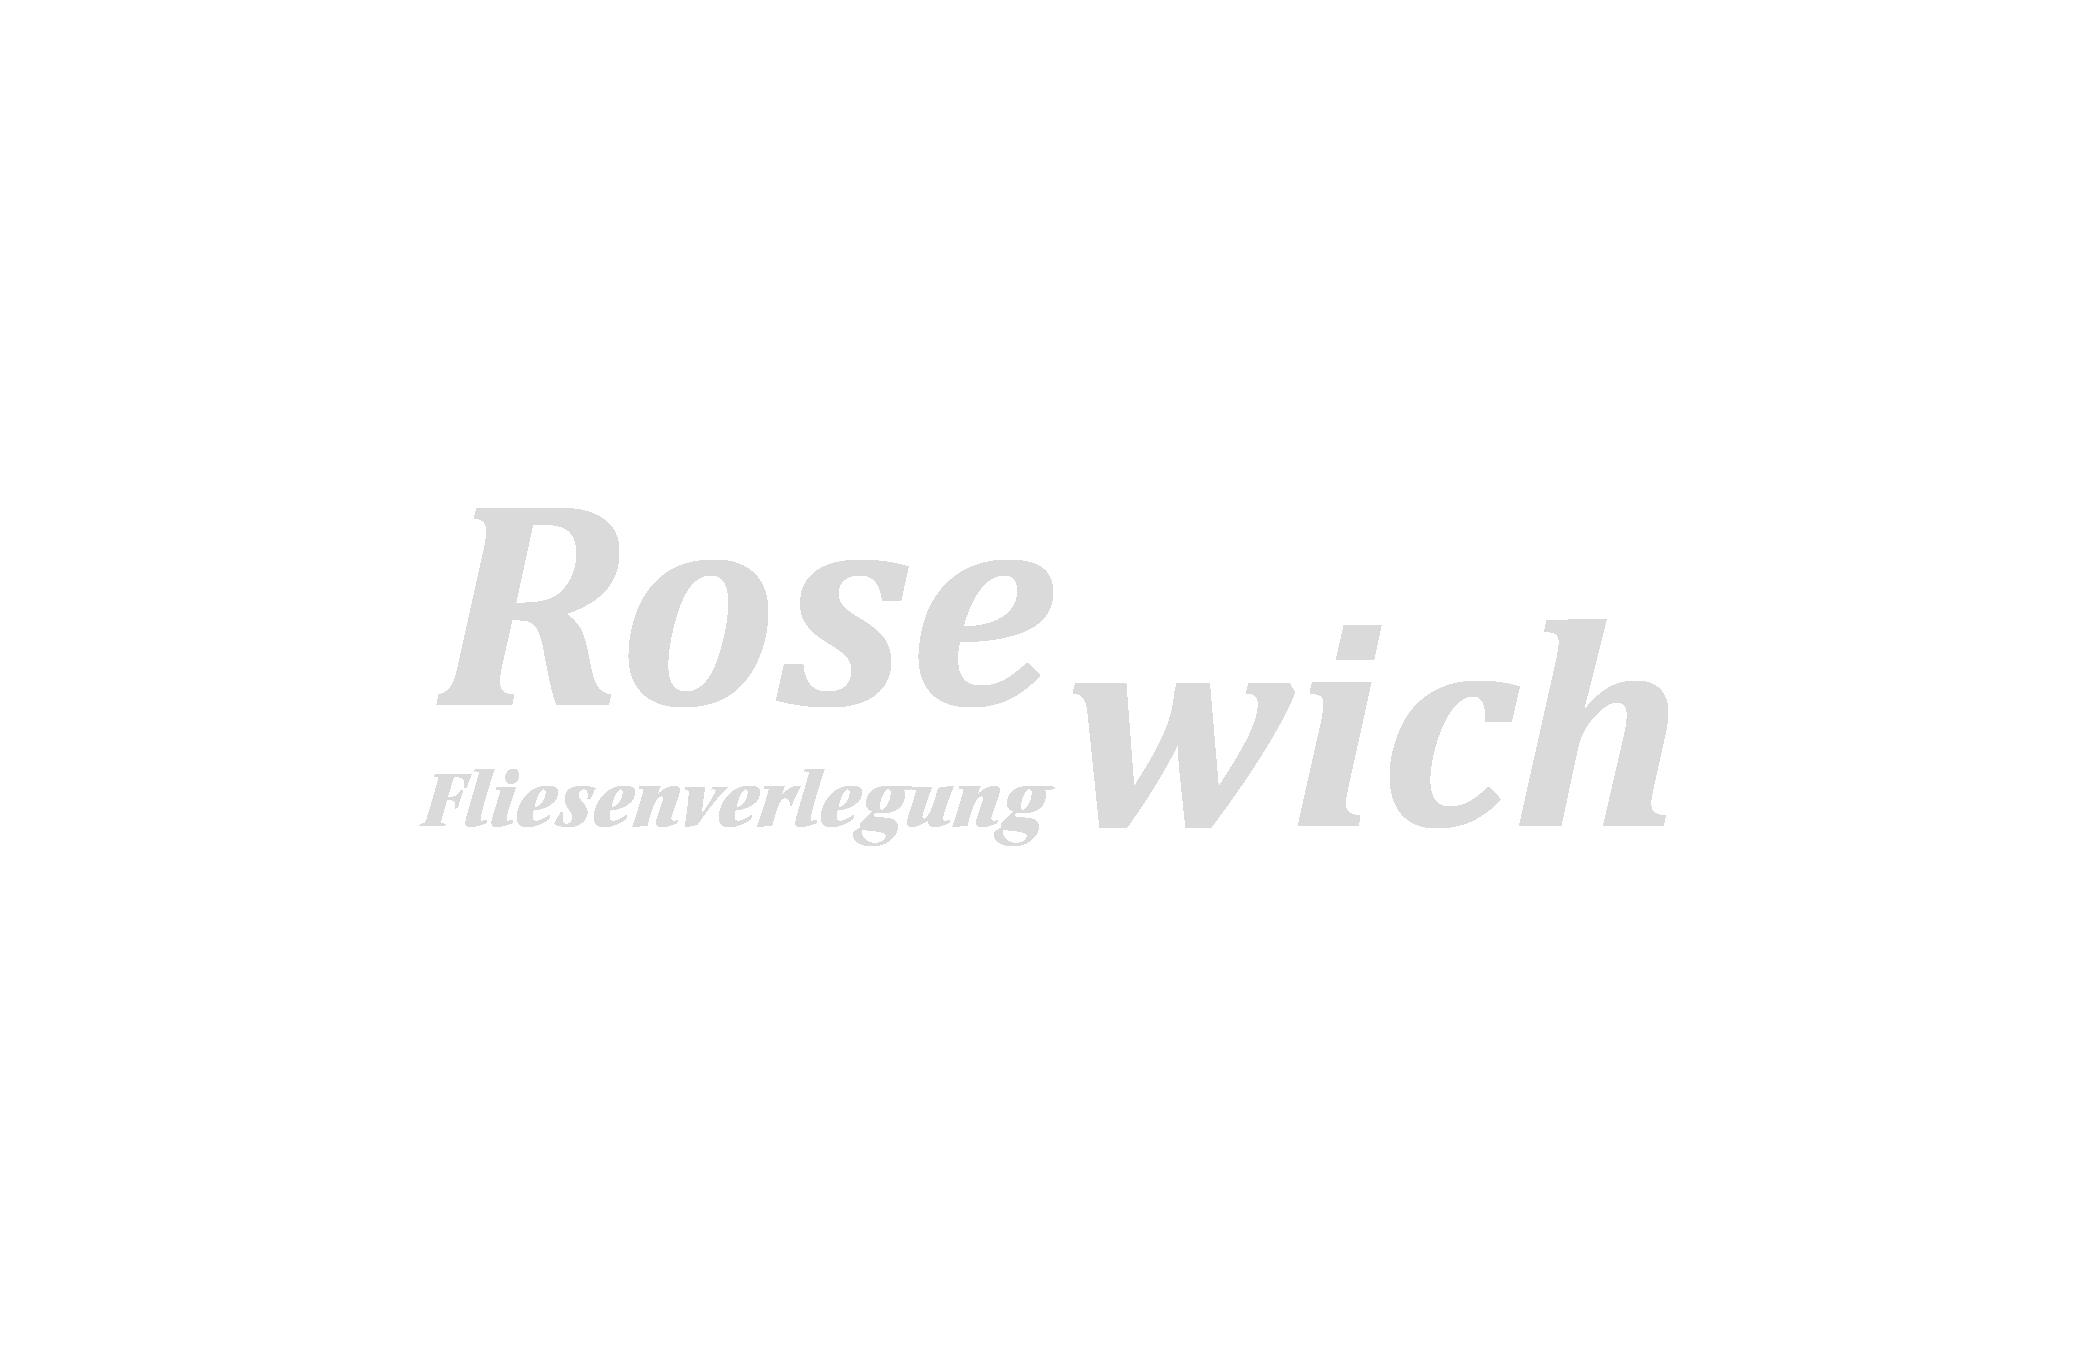 Fliesenverlegung Rosewich